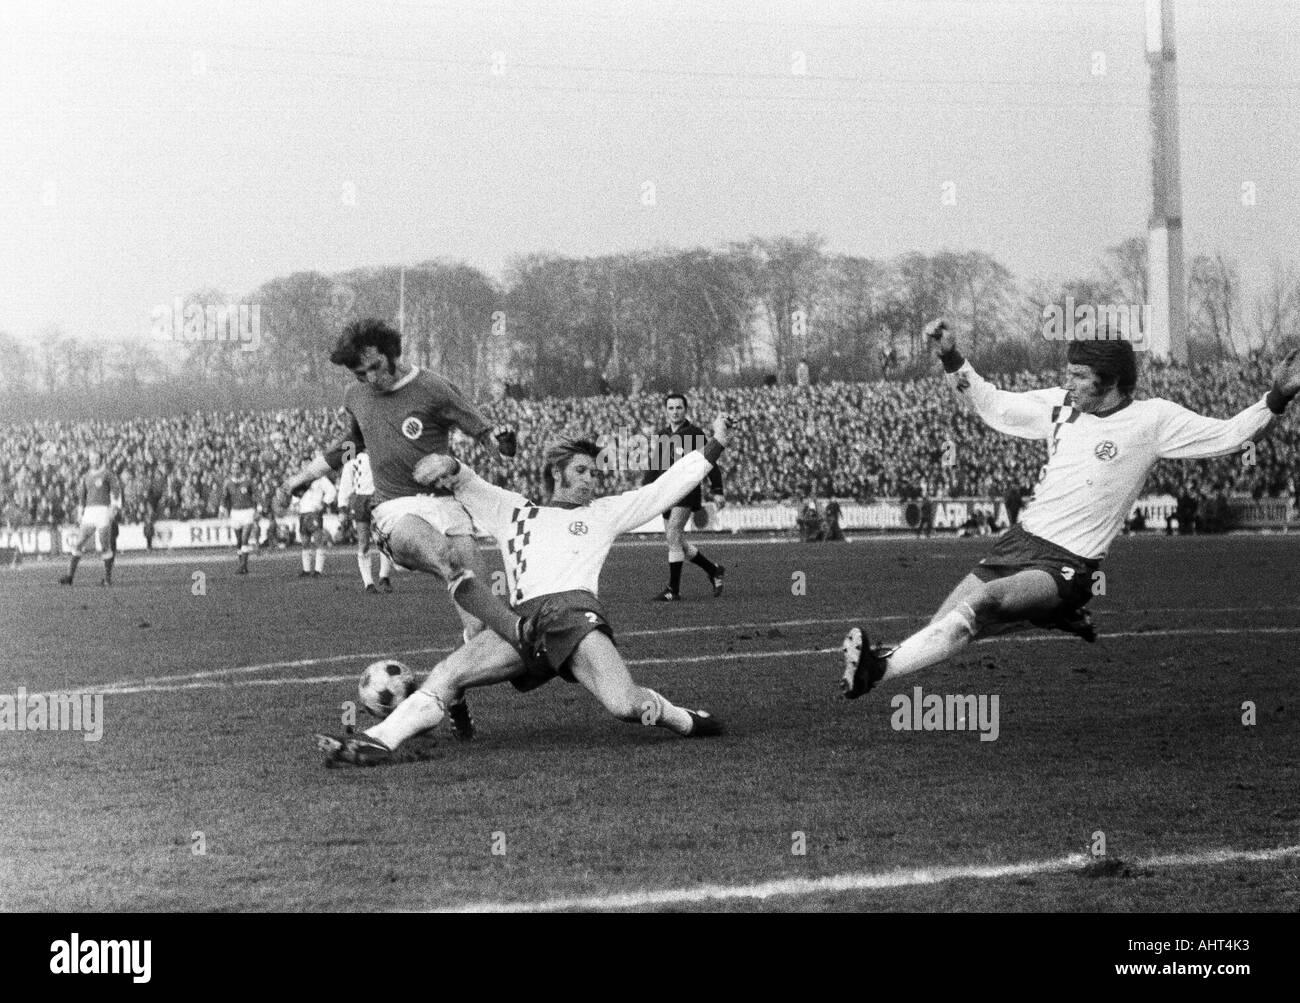 football, Bundesliga, 1970/1971, Niederrhein Stadium, Rot-Weiss Oberhausen versus Rot-Weiss Essen 0:0, scene of the match, f.l.t.r. Wolfgang Suehnholz (RWO), Peter Czernotzky (RWE), referee Alfons Betz from Regensburg, Hermann Erlhoff (RWE) - Stock Image